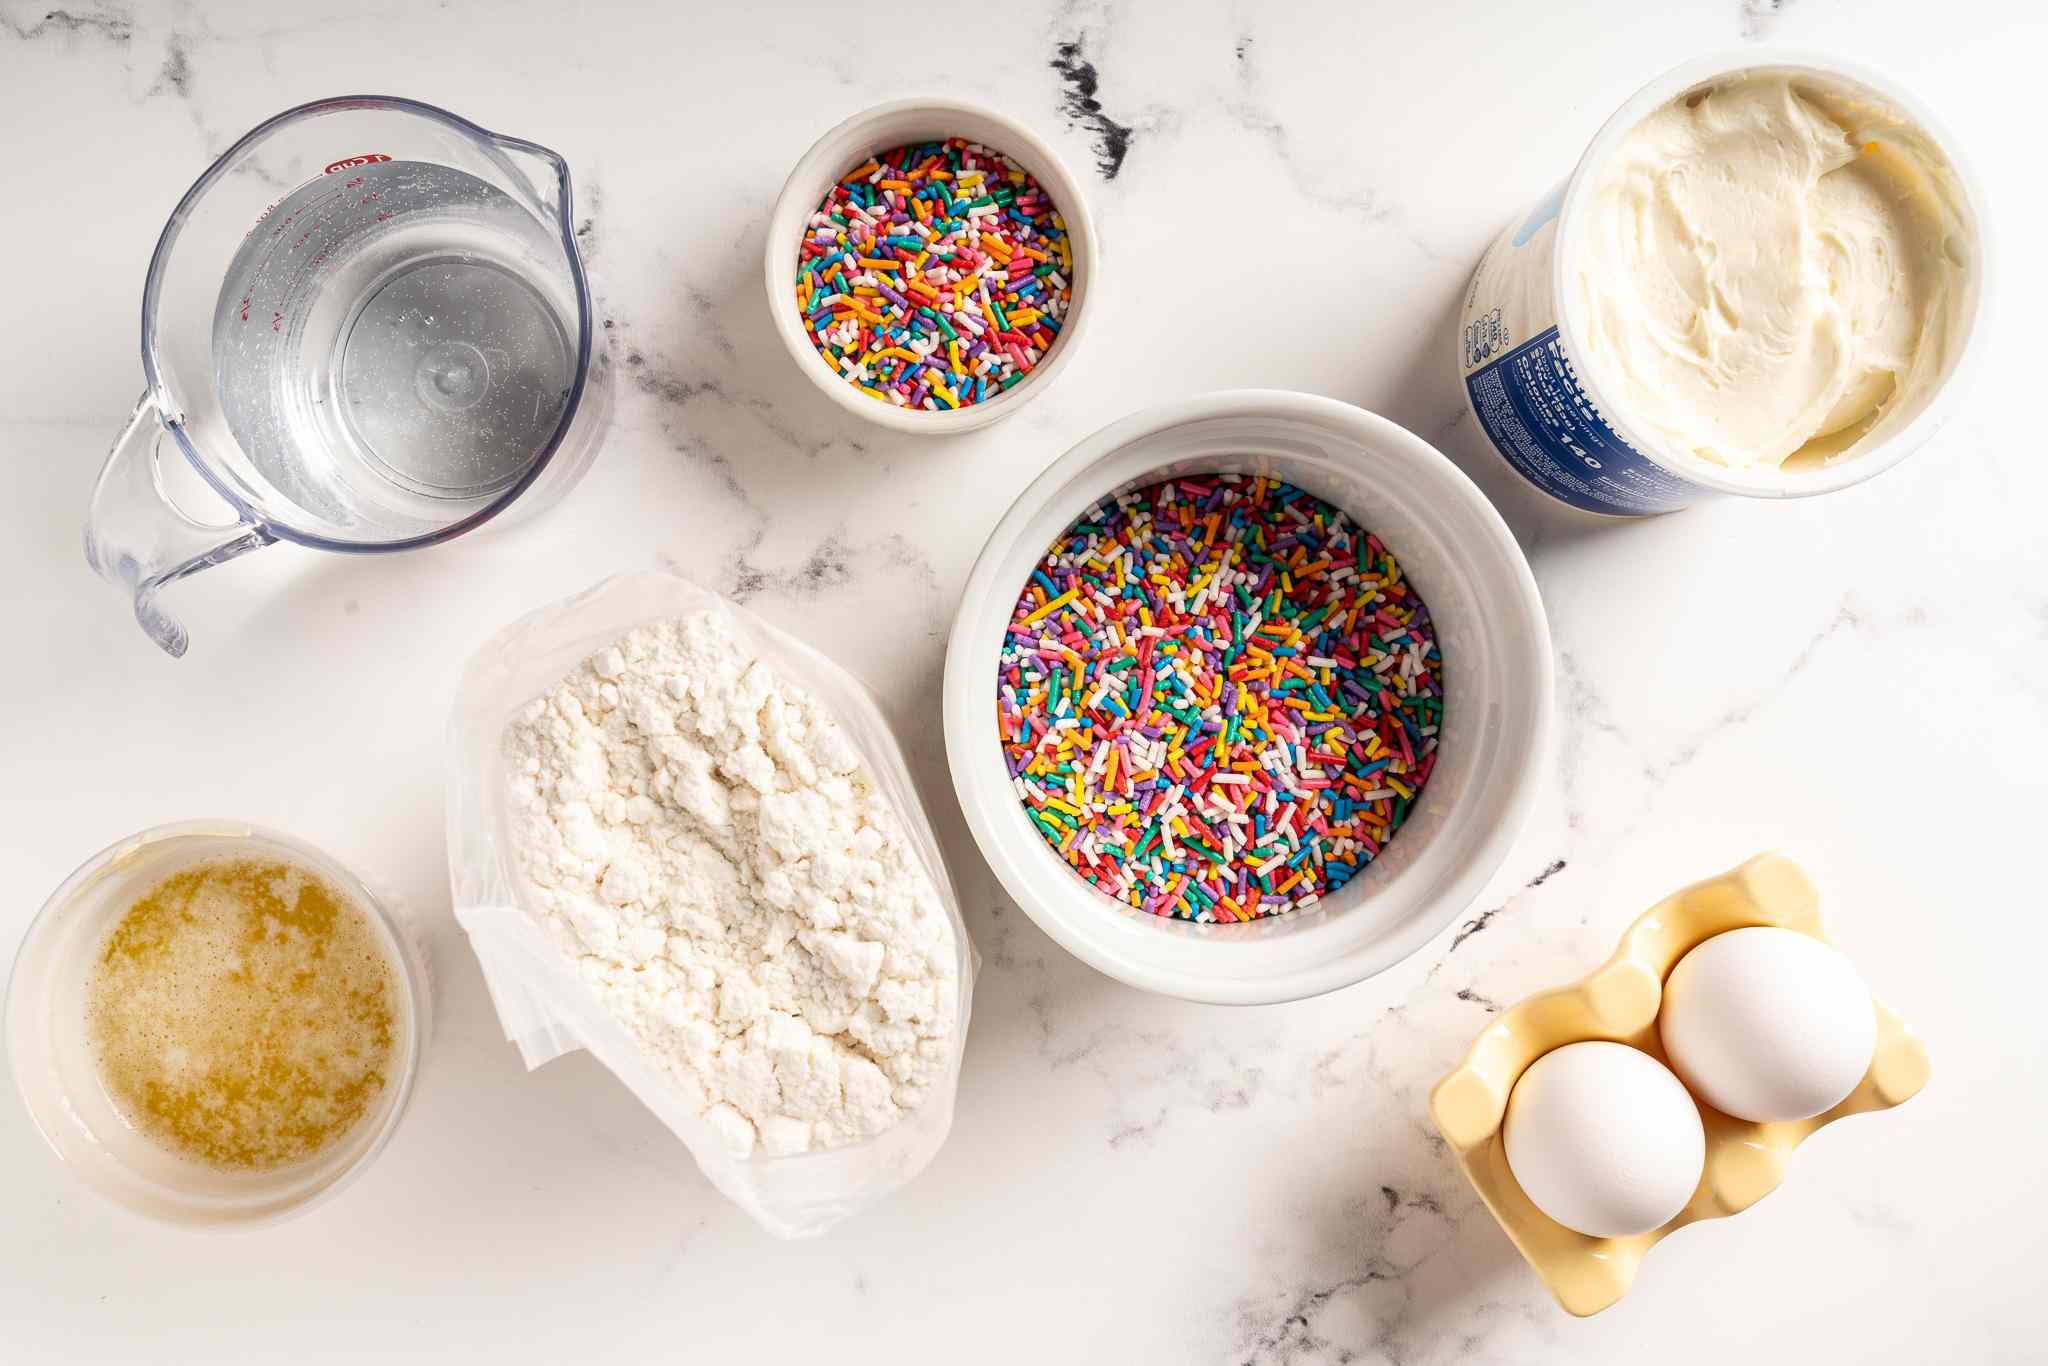 Funfetti Waffle Birthday Cake ingredients